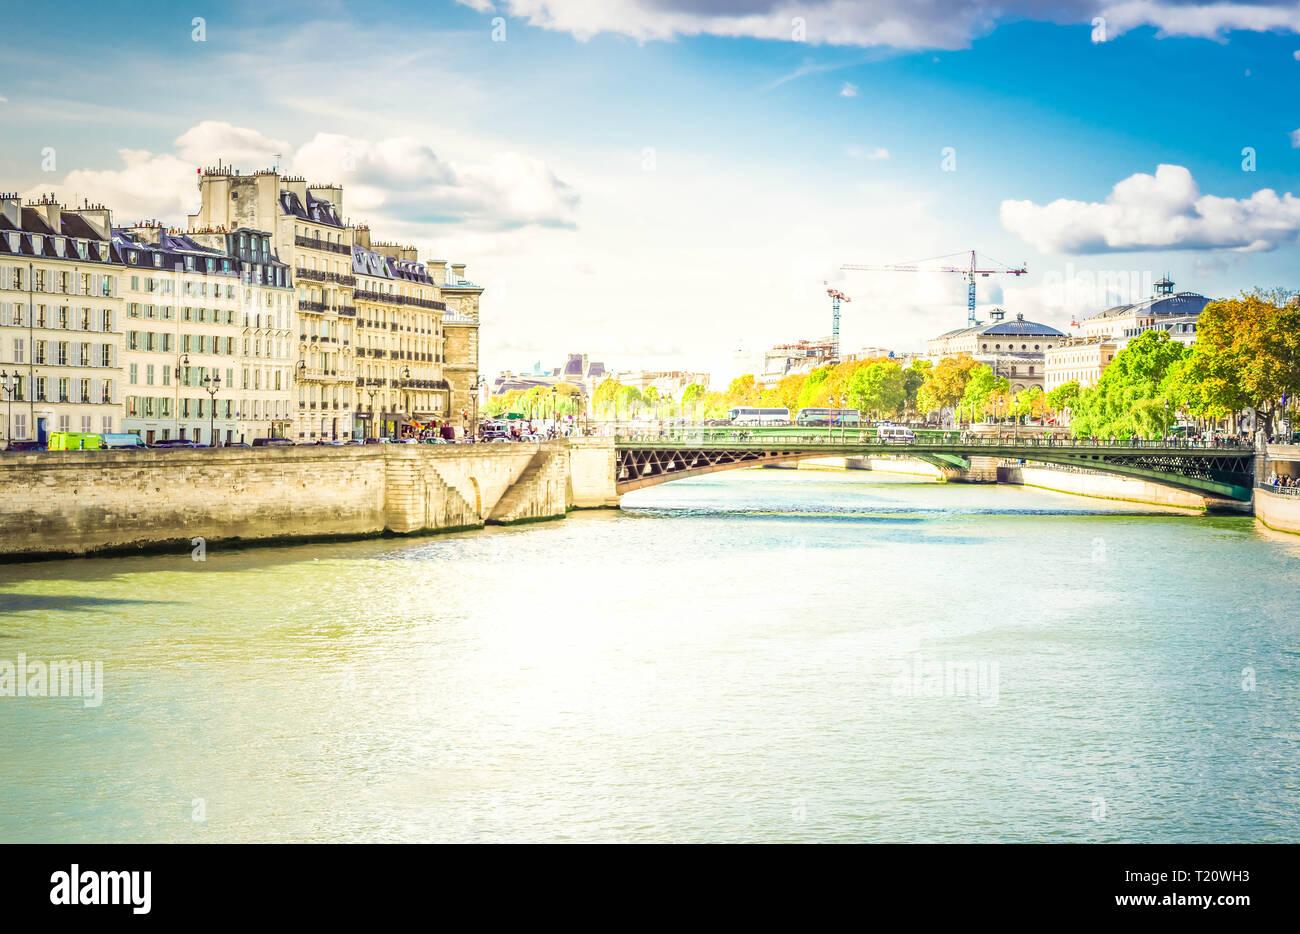 Pont au Double bridge and island Cite, blue sky with clouds, Paris, France, toned - Stock Image